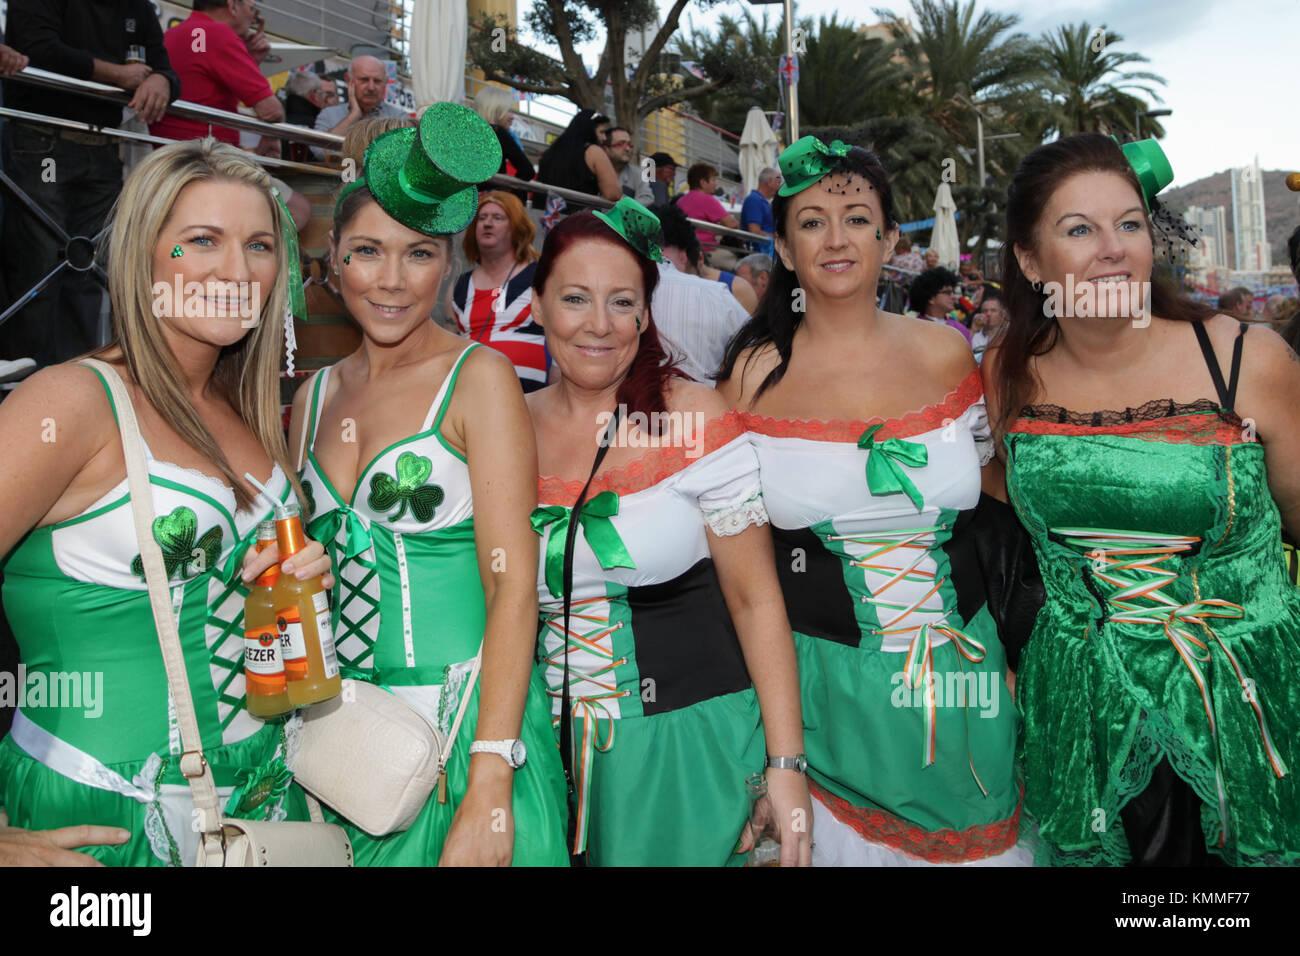 Benidorm new town British fancy dress day group of irish women dressed in shamrock costumes  sc 1 st  Alamy & Benidorm new town British fancy dress day group of irish women Stock ...